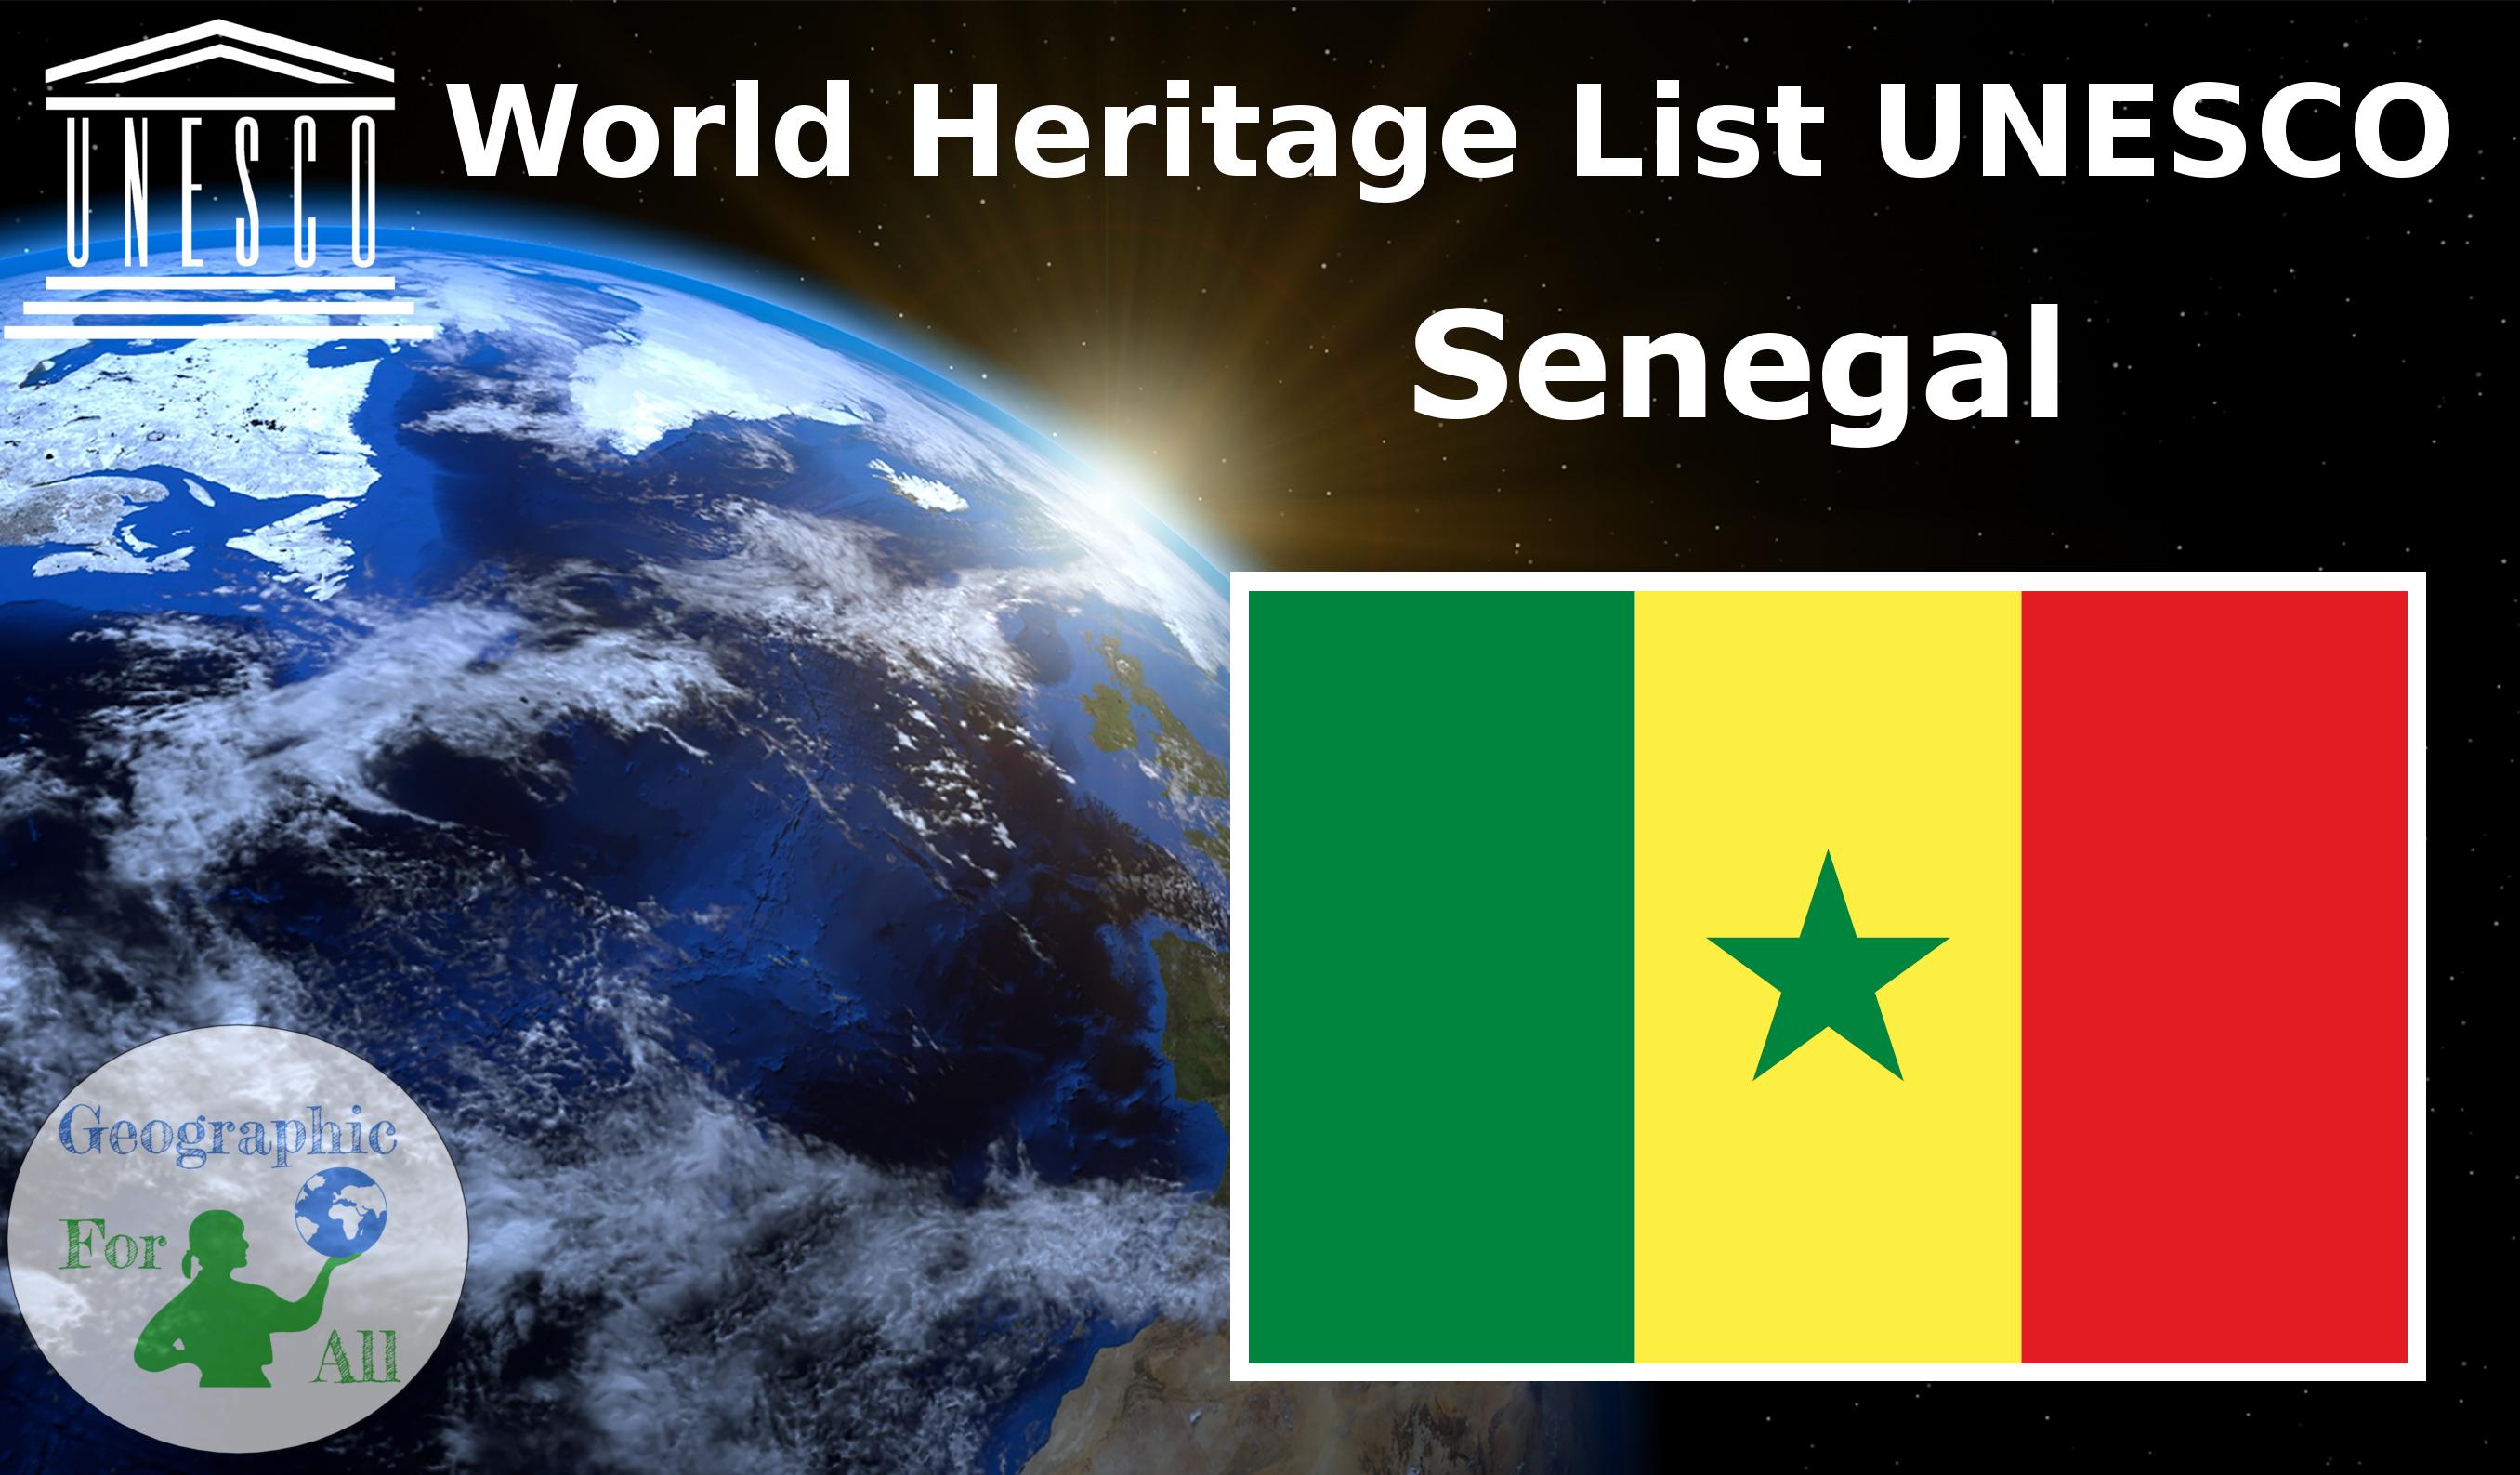 World Heritage List UNESCO - Senegal